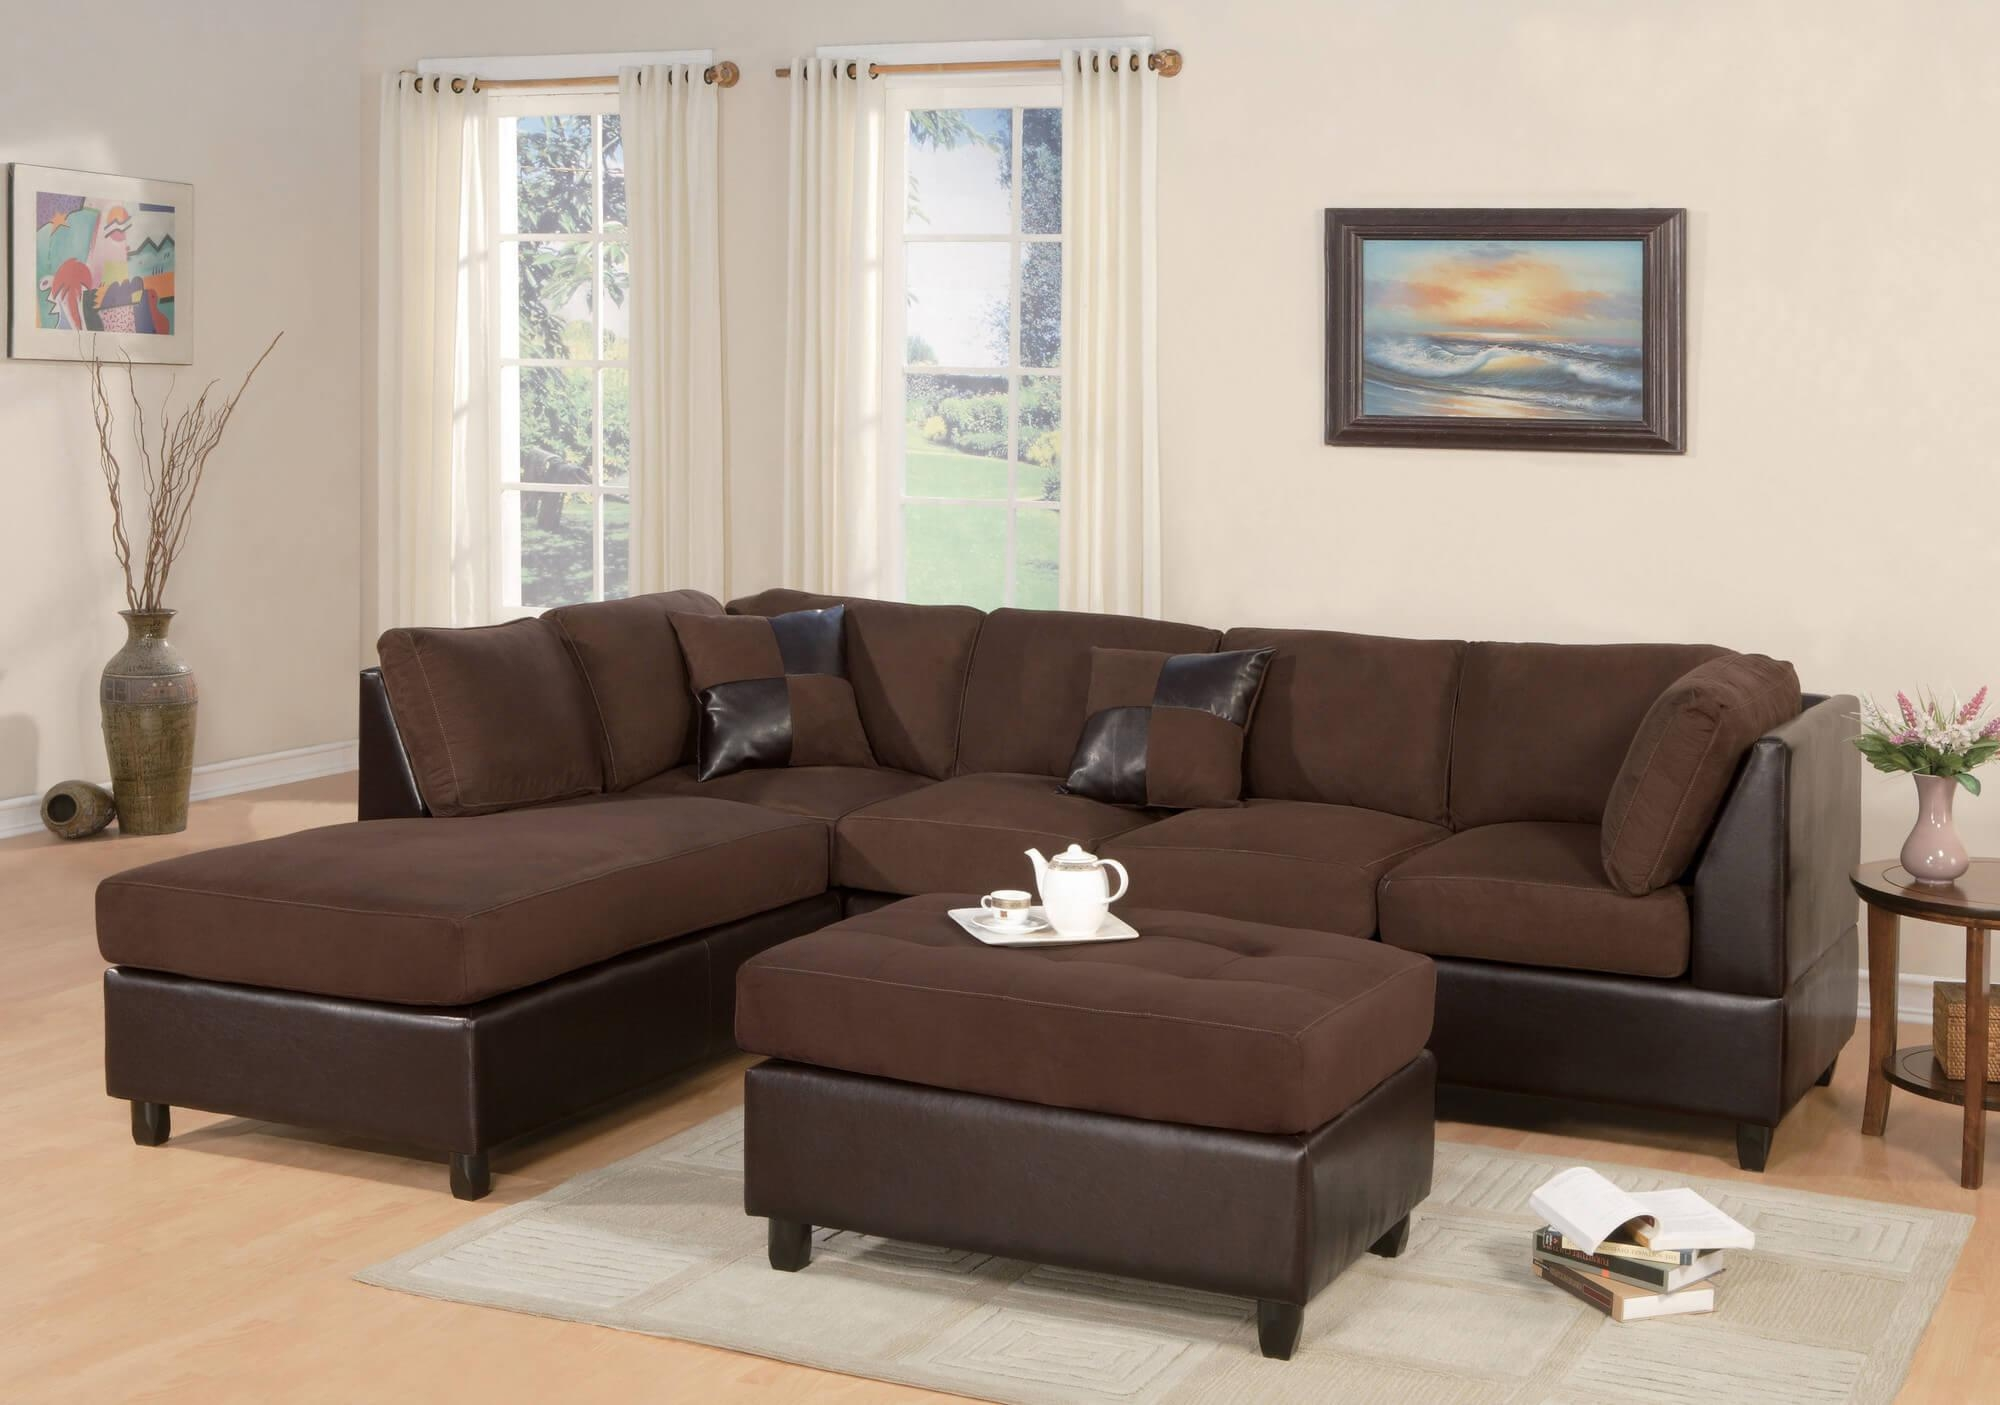 Sofas Center : Sofa Sleeper Atg Lots Furniture Sofas For Sale And Regarding Big Lots Sofa Sleeper (View 12 of 20)